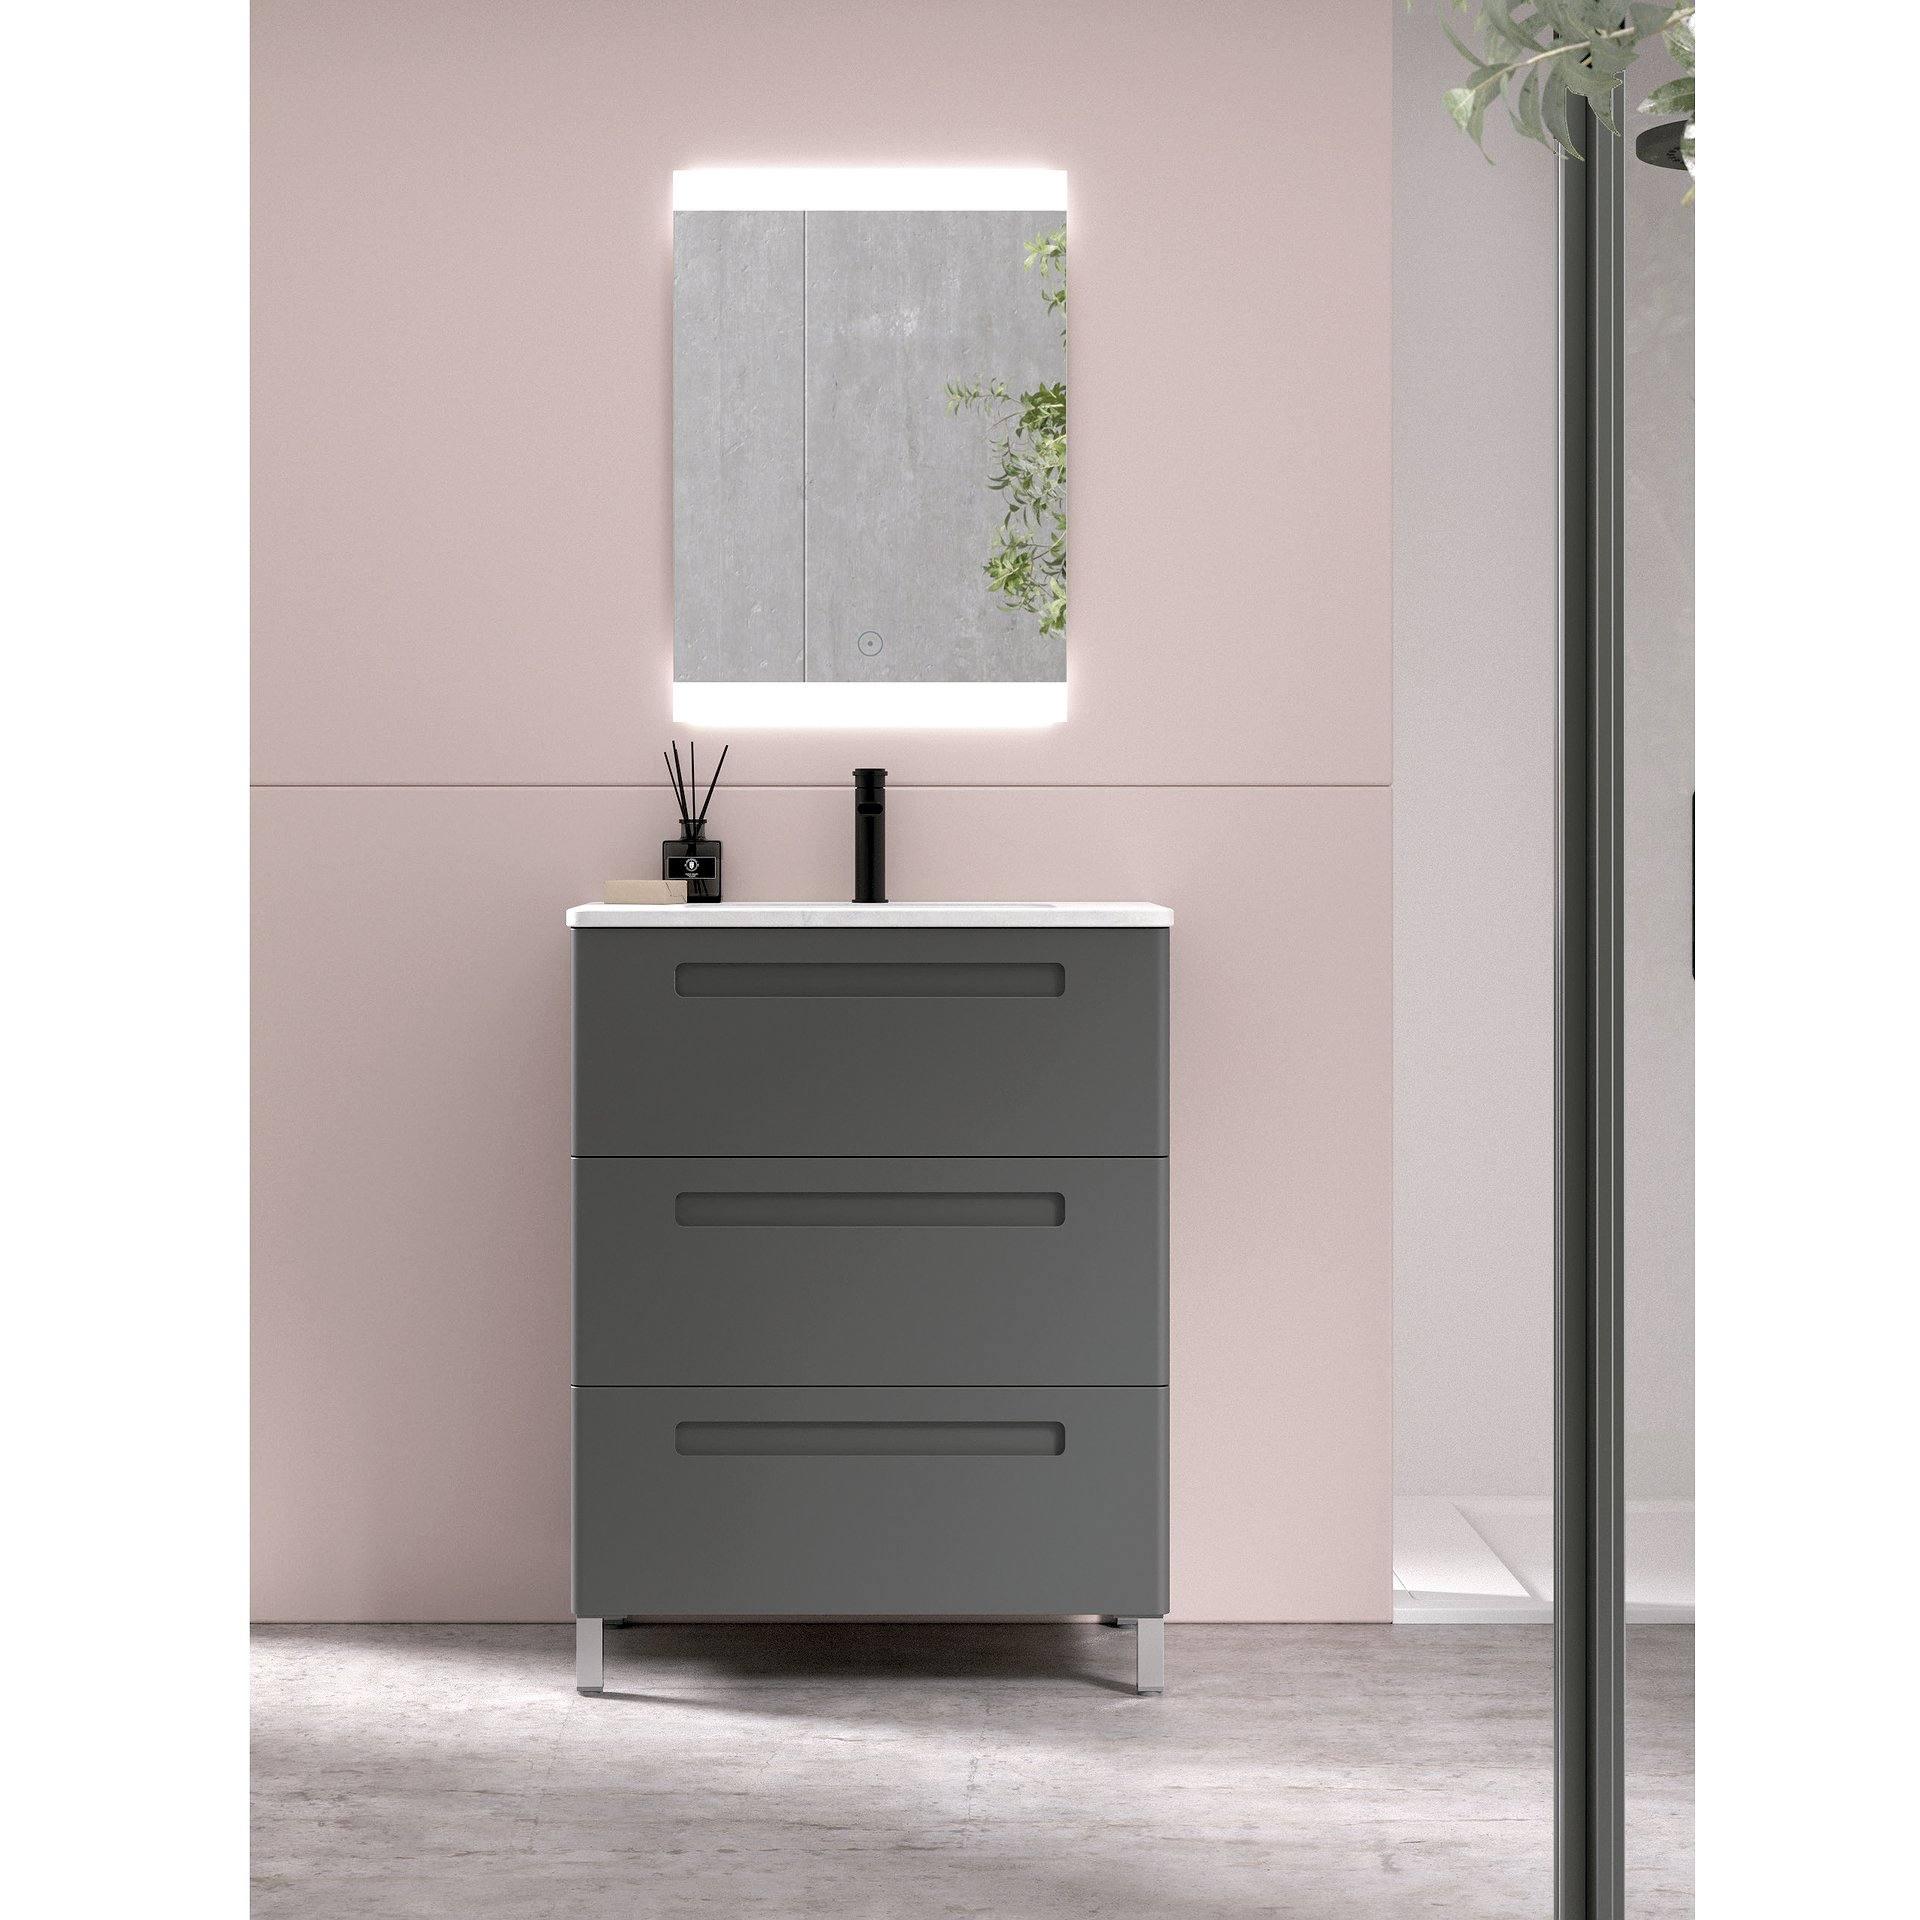 Conjunto mueble de baño de fondo reducido 39 cm de Avila ...